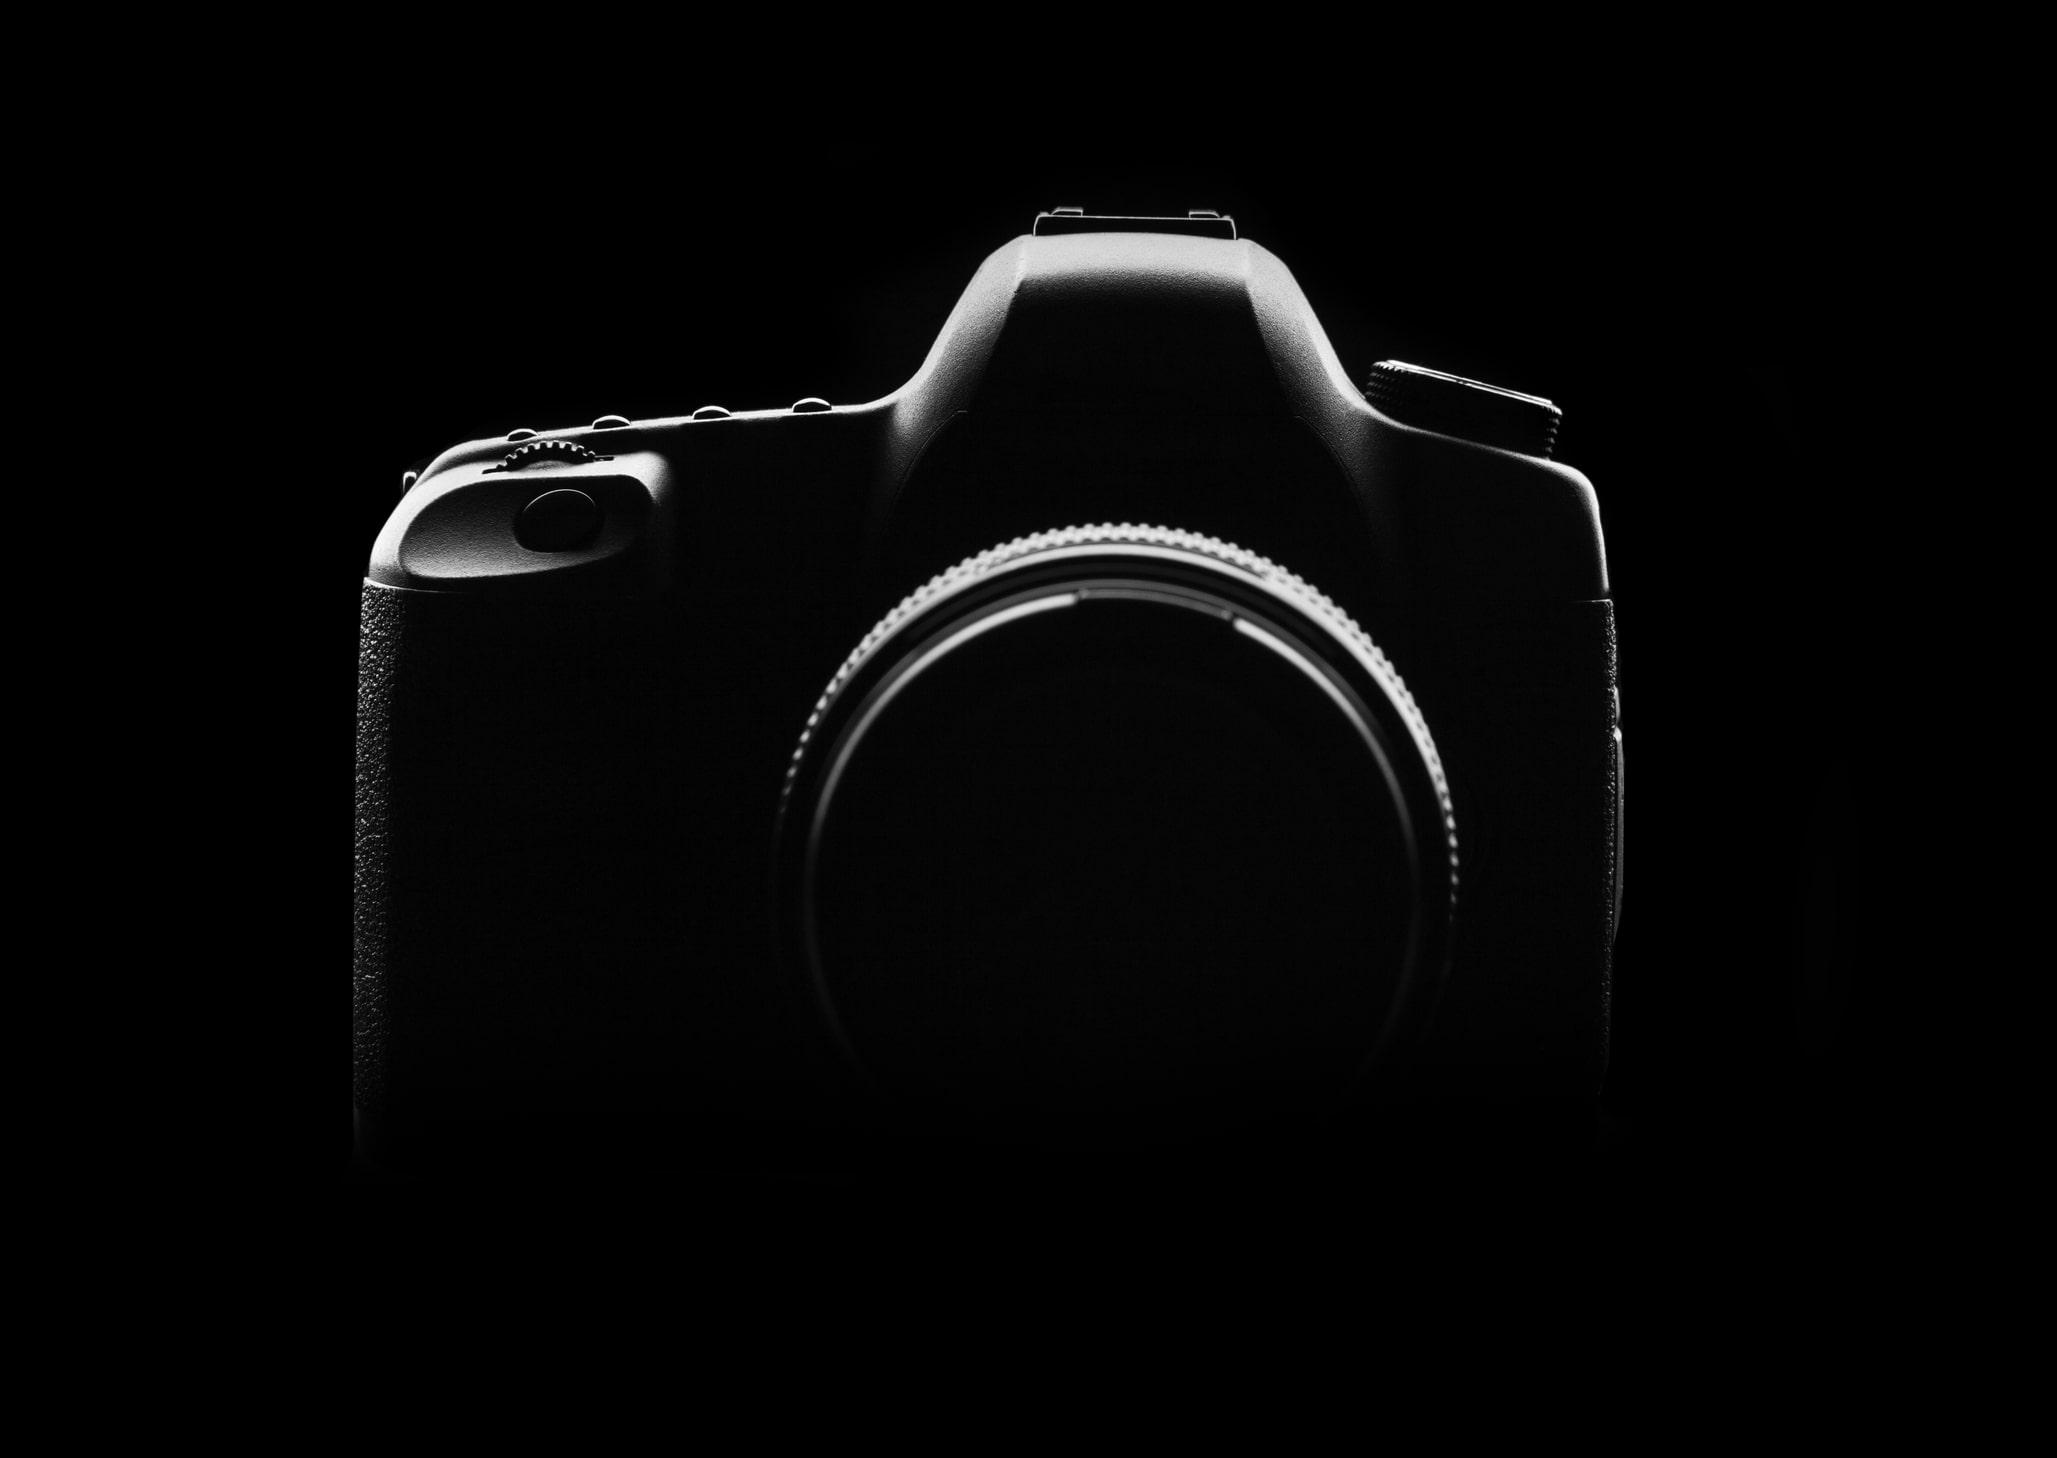 Camera Rumors 2019: Canon, Nikon, and Sony Have Big Plans